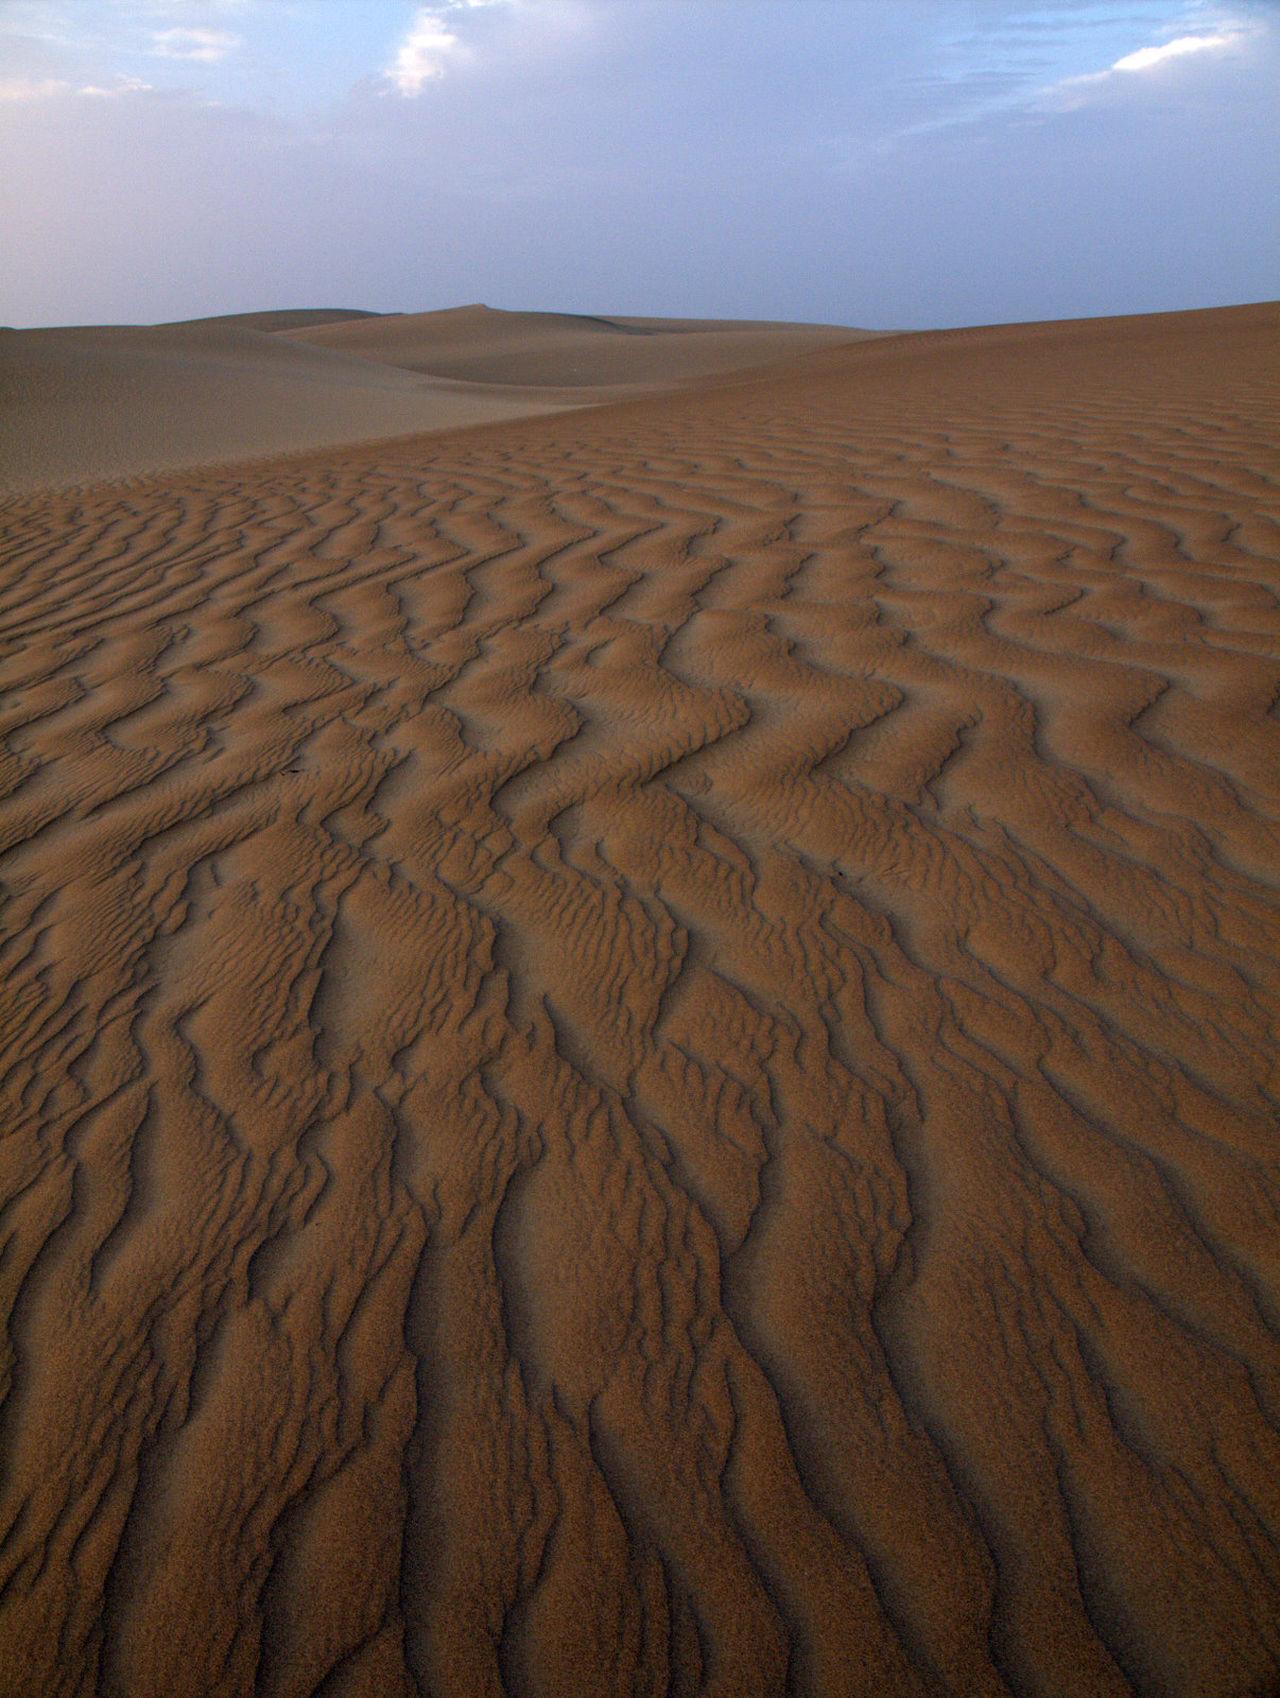 Desesrt, Reservada Laguna de Huacachina, ICA Peru Desert Dry Exploring Geology Landscape Natural Pattern Outdoors Pattern Remote Reservada Laguna De Huacachina Sand Sand Dune